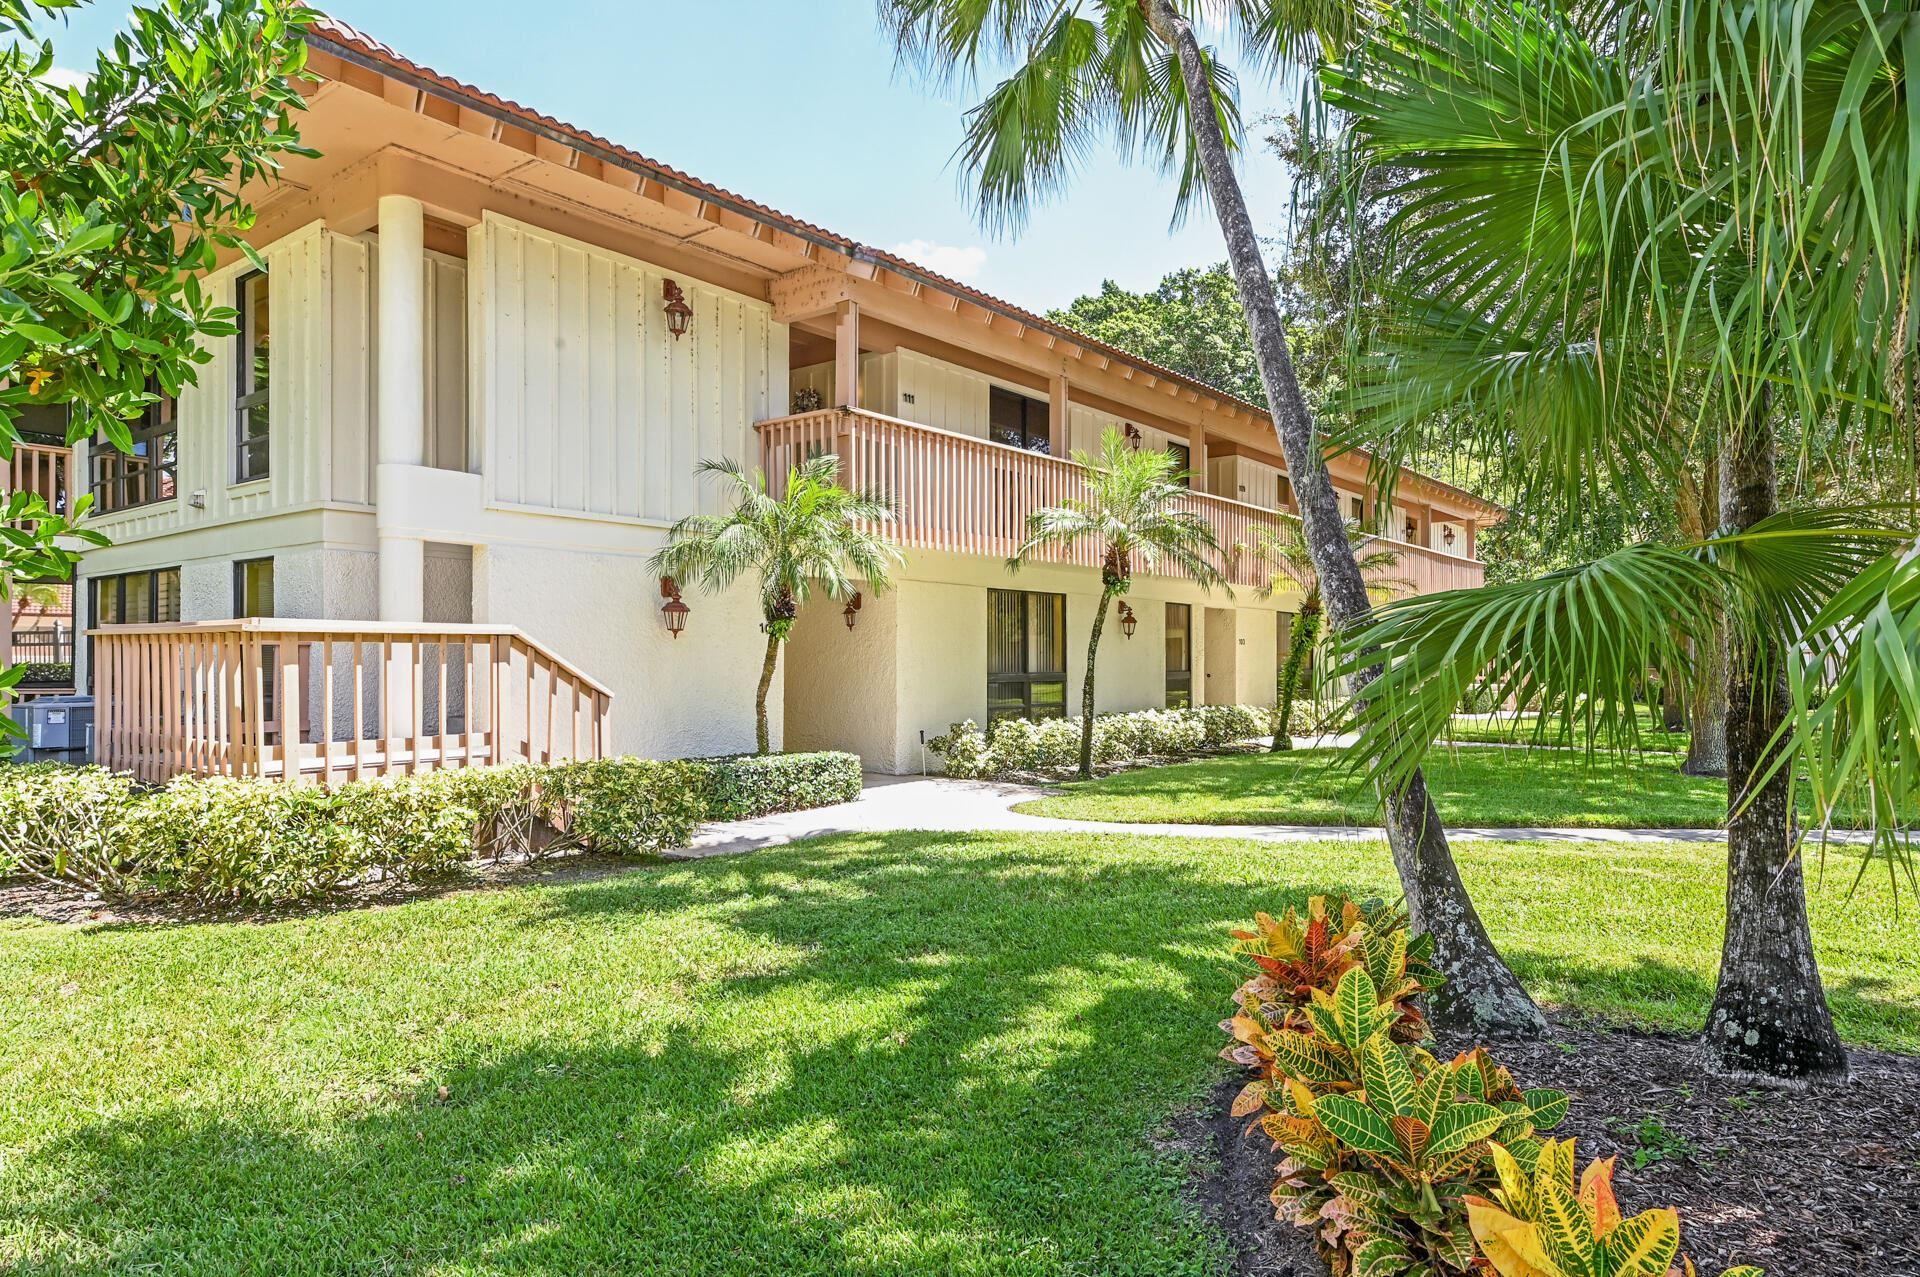 Photo of 111 Brackenwood Road, Palm Beach Gardens, FL 33418 (MLS # RX-10745871)